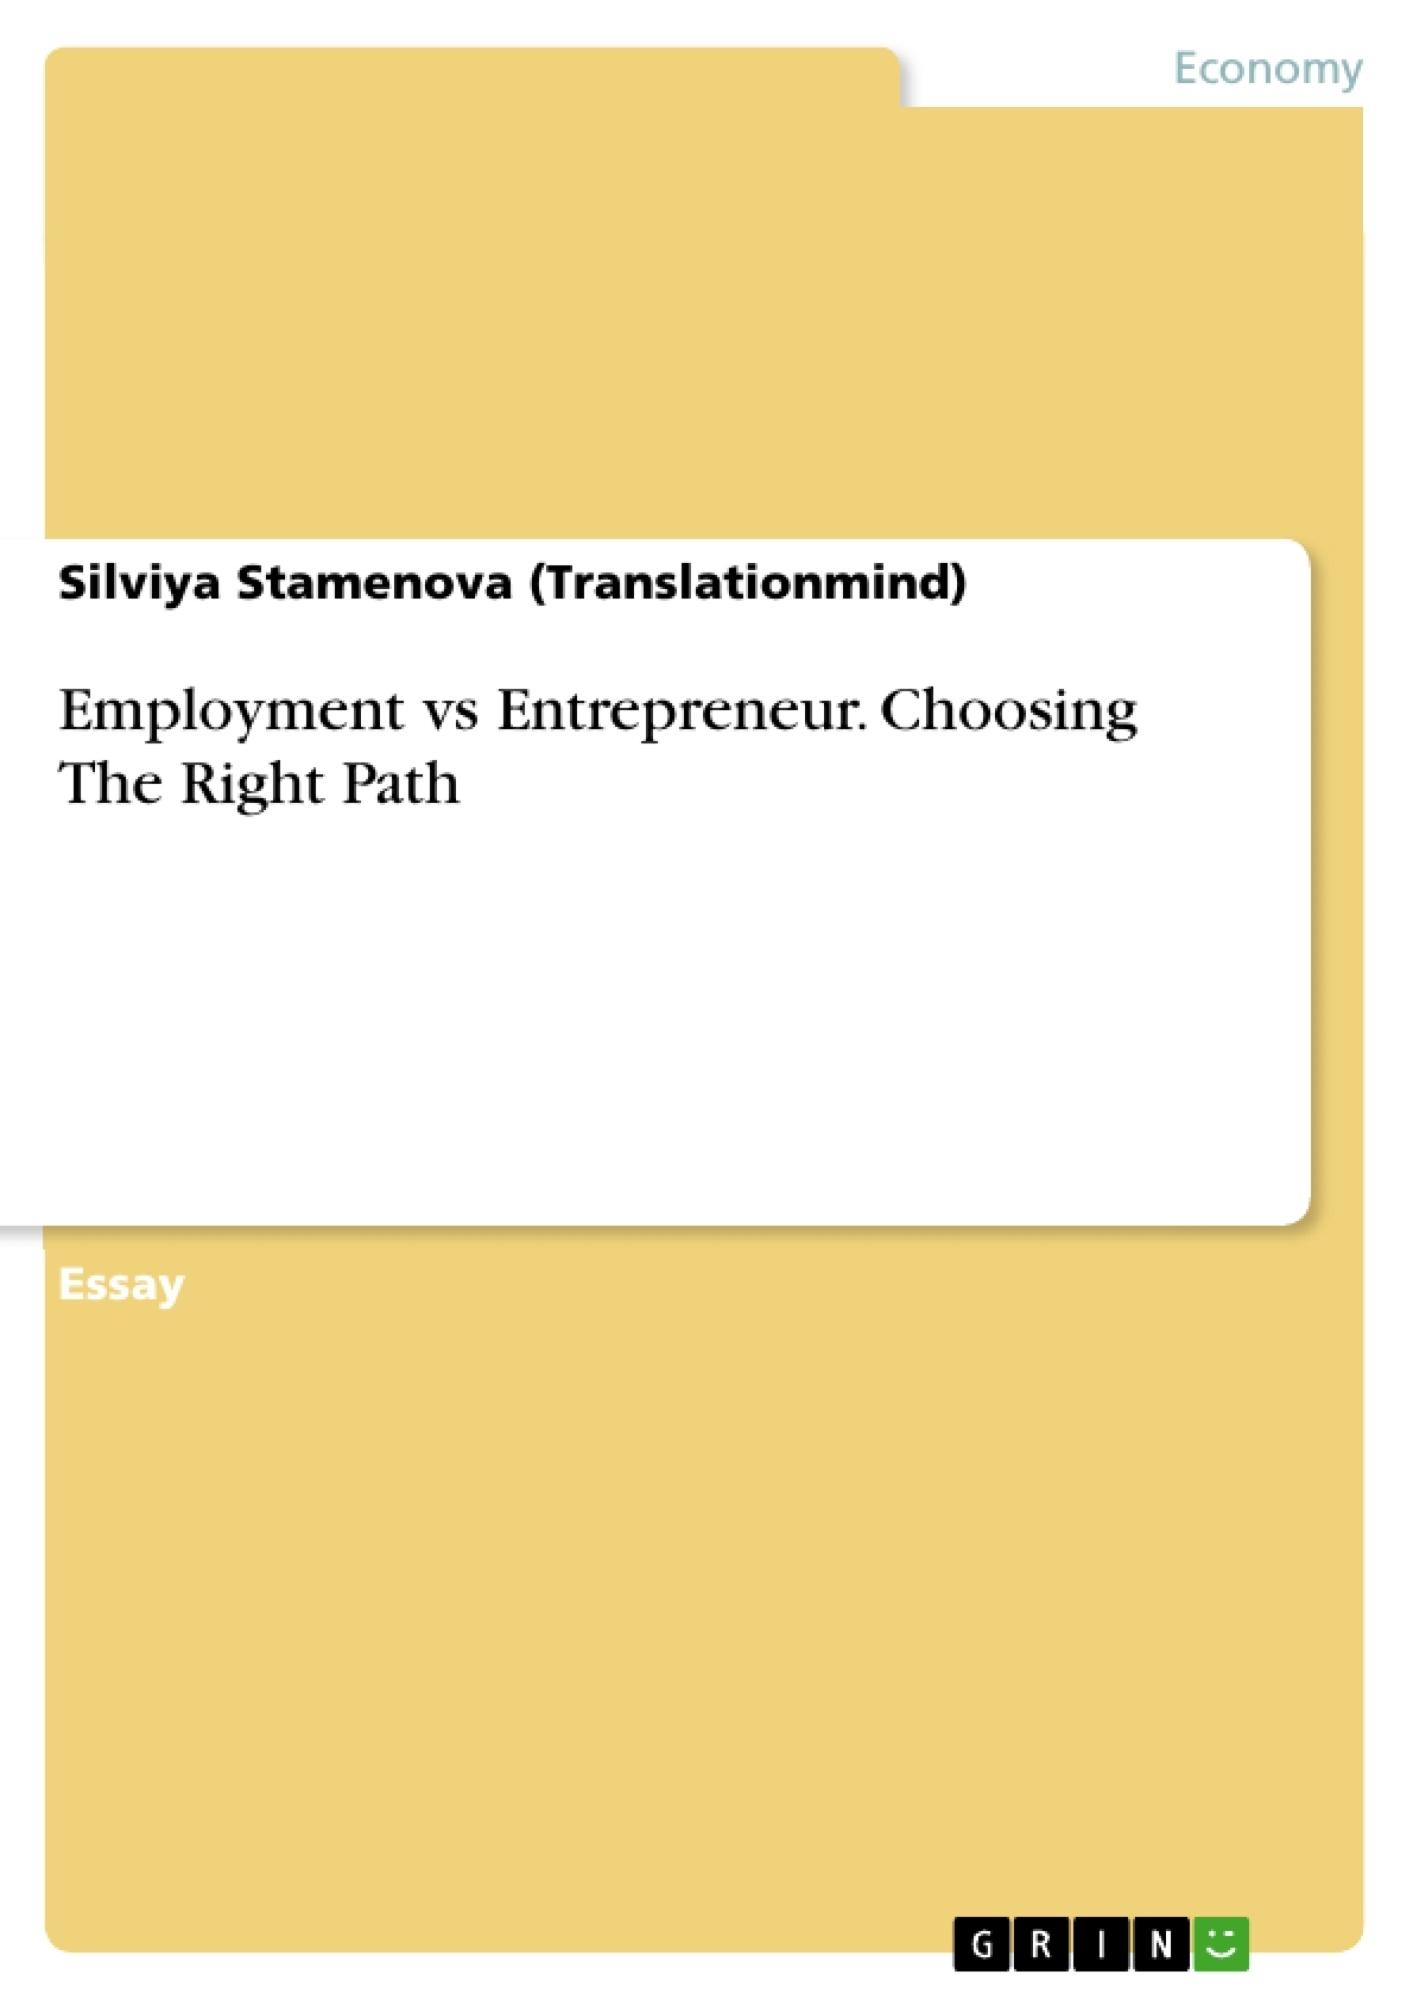 Title: Employment vs Entrepreneur. Choosing The Right Path